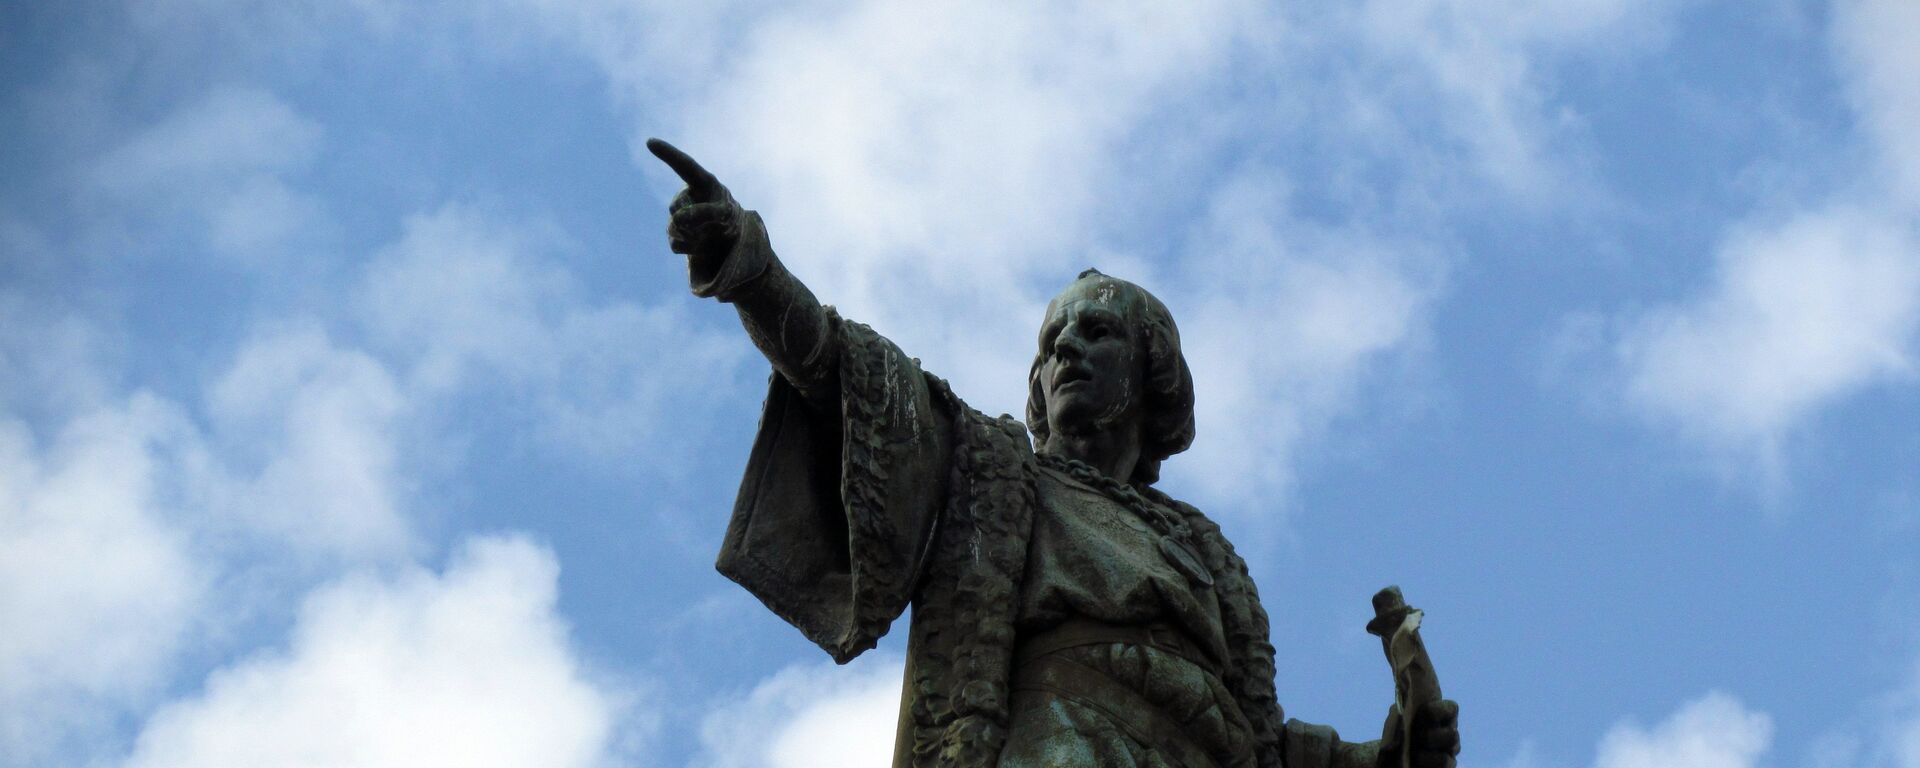 El monumento de Cristóbal Colón en Barcelona, España - Sputnik Mundo, 1920, 12.10.2020